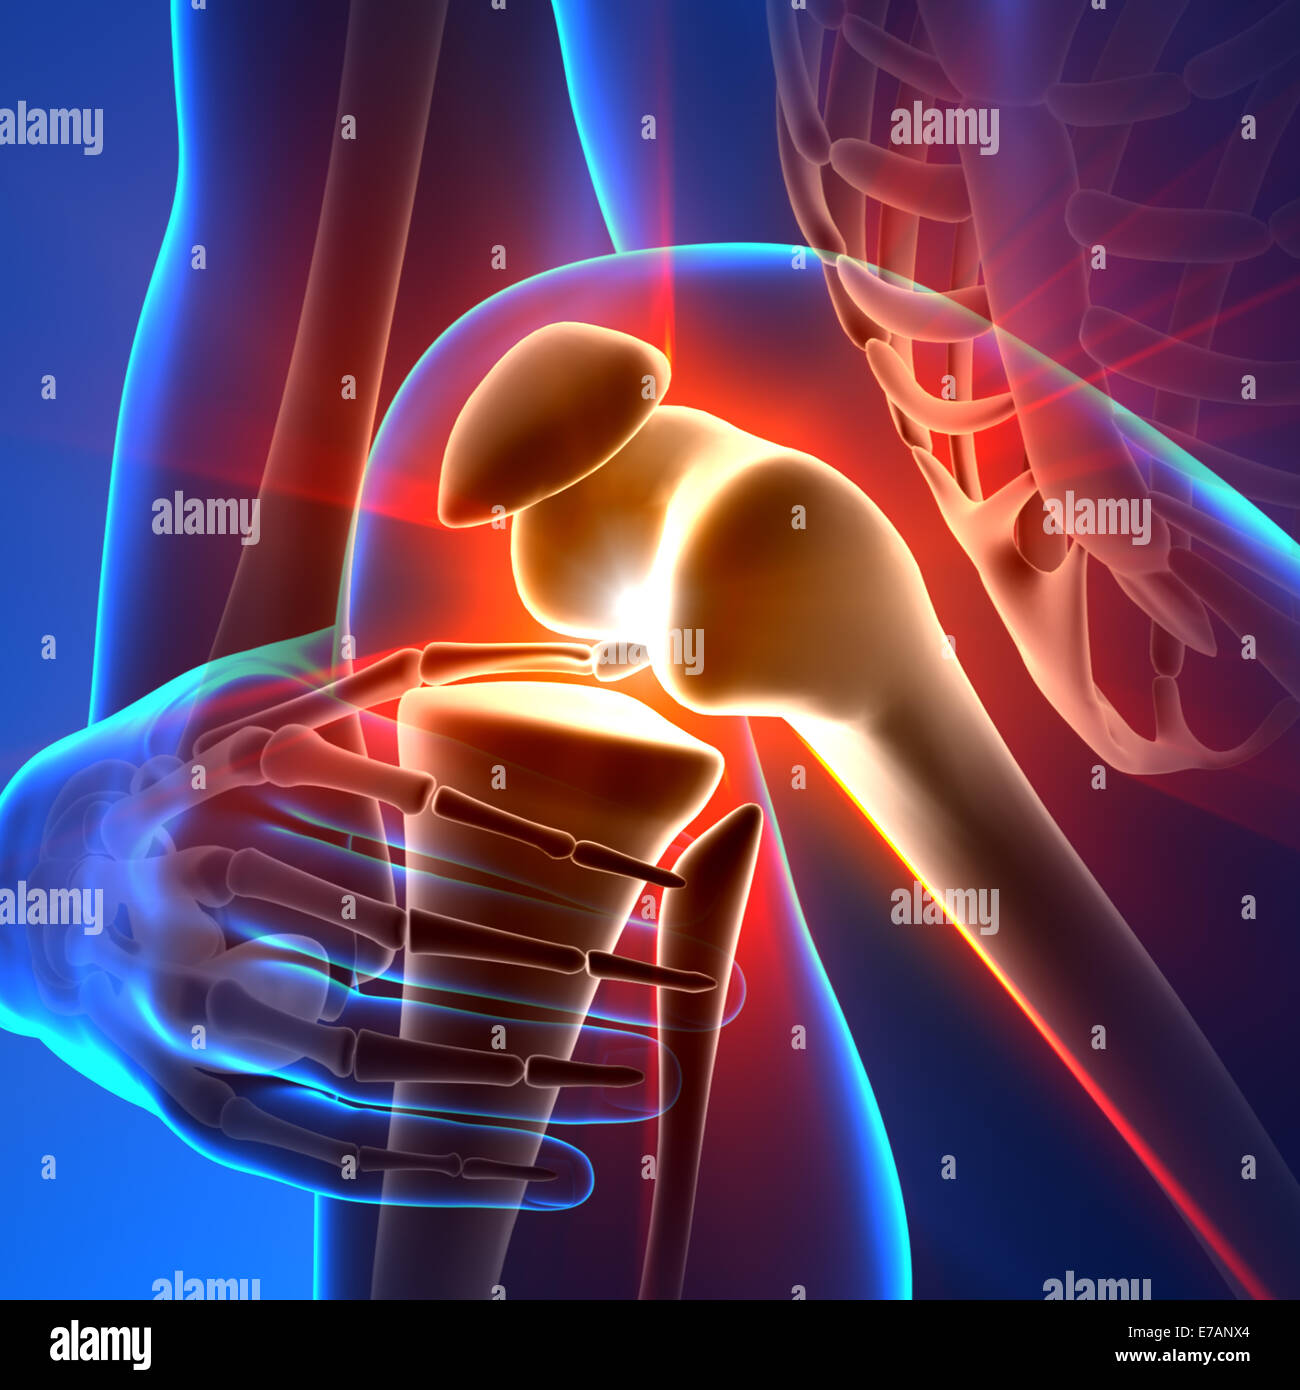 Anatomie du genou douleur - Rayons X Photo Stock